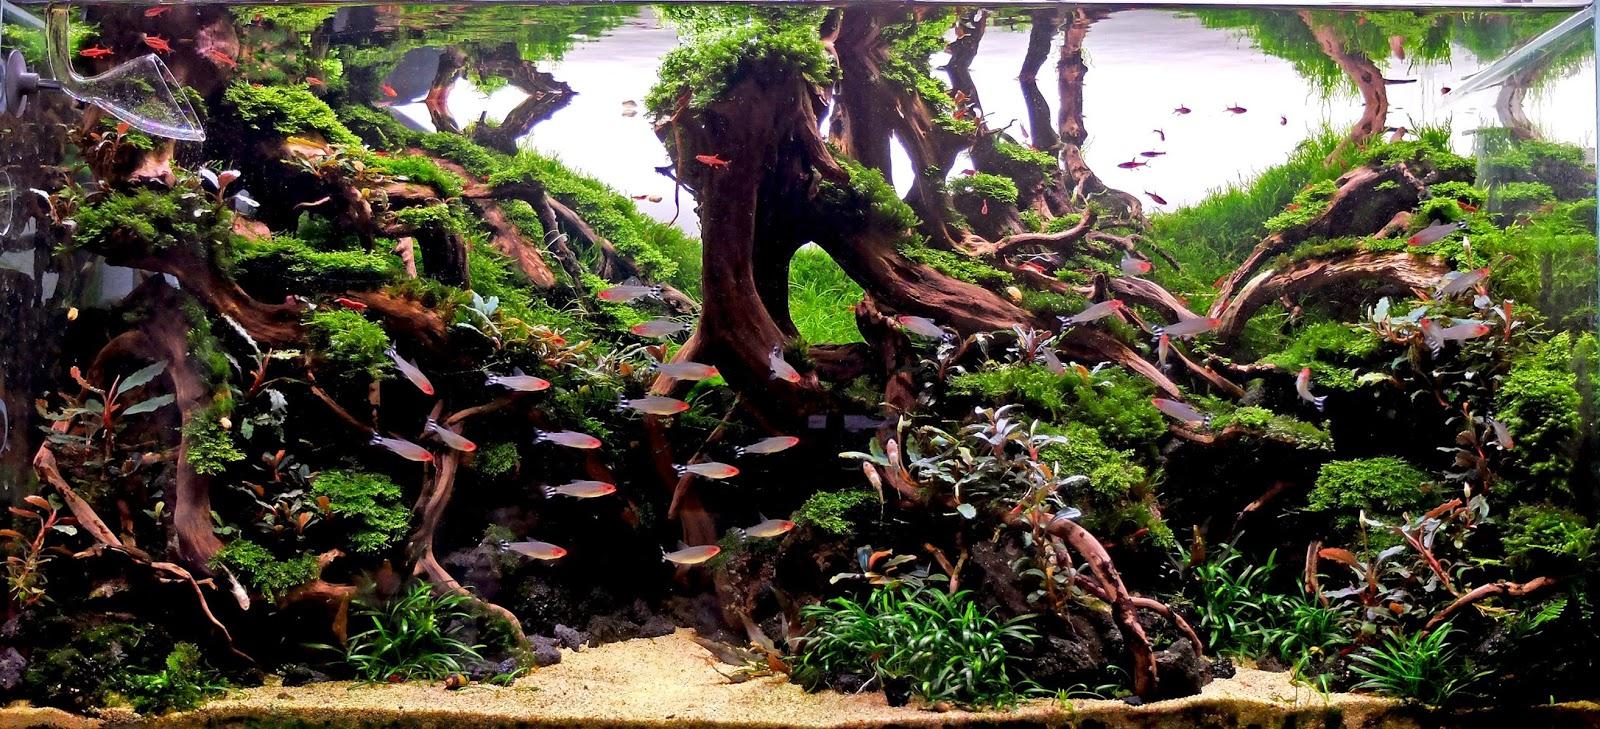 The Diorama Aquascape